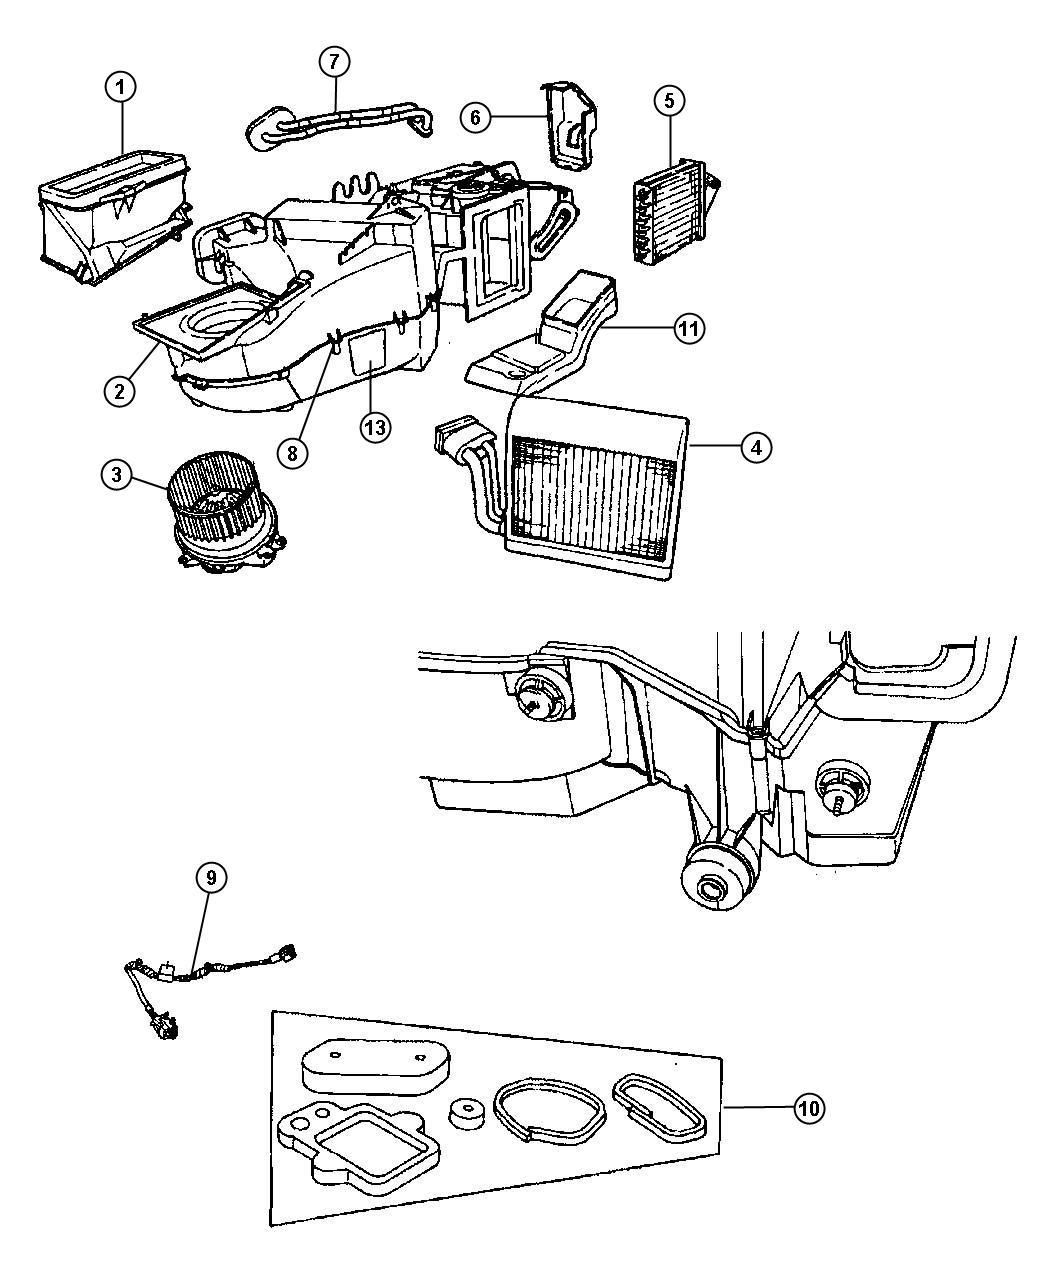 Chrysler Pt Cruiser Core Heater Air Conditioning